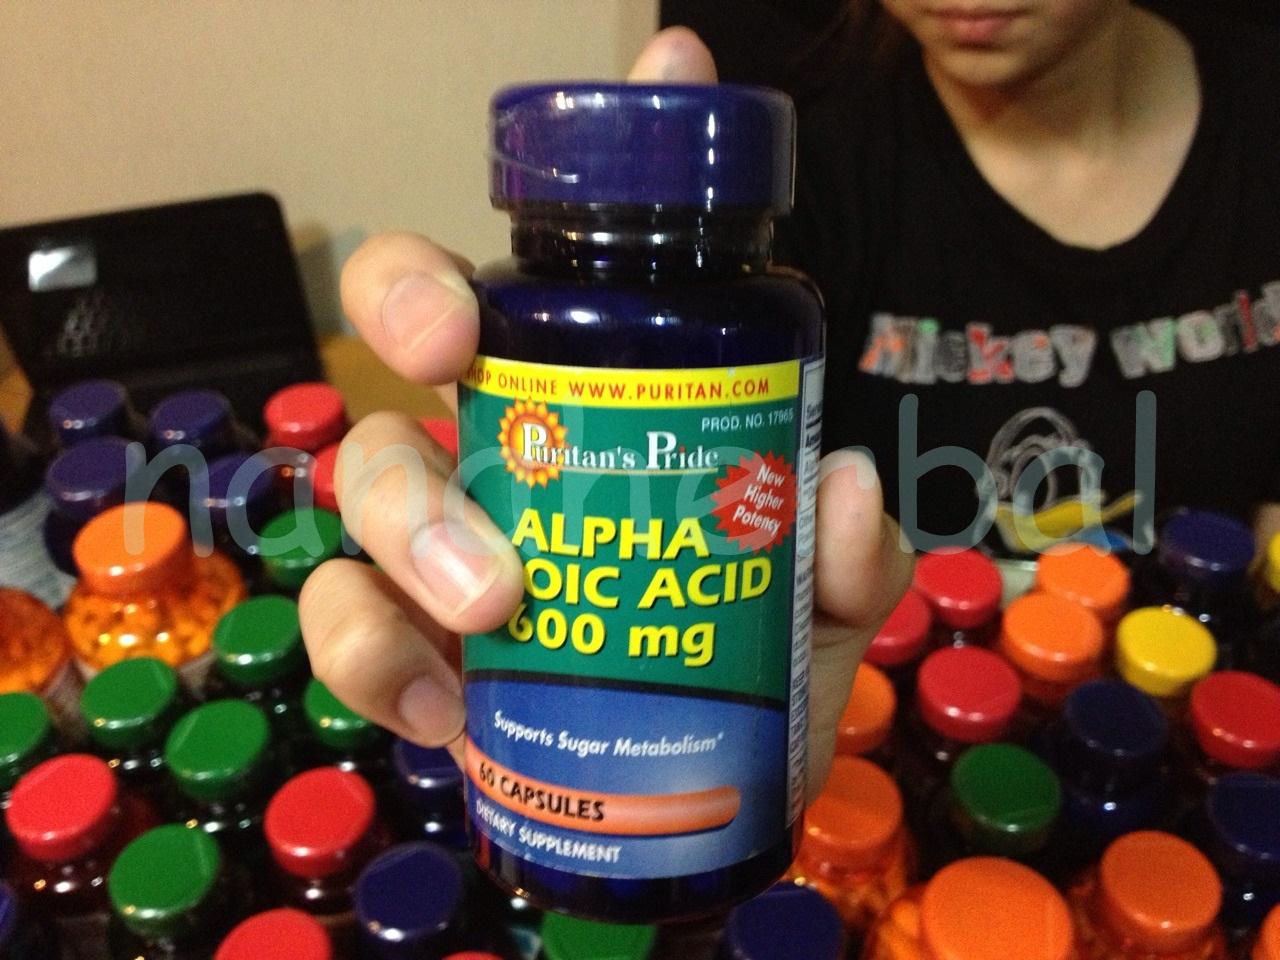 Puritan's Pride Alpha Lipoic Acid 600 mg. 60 Capsules